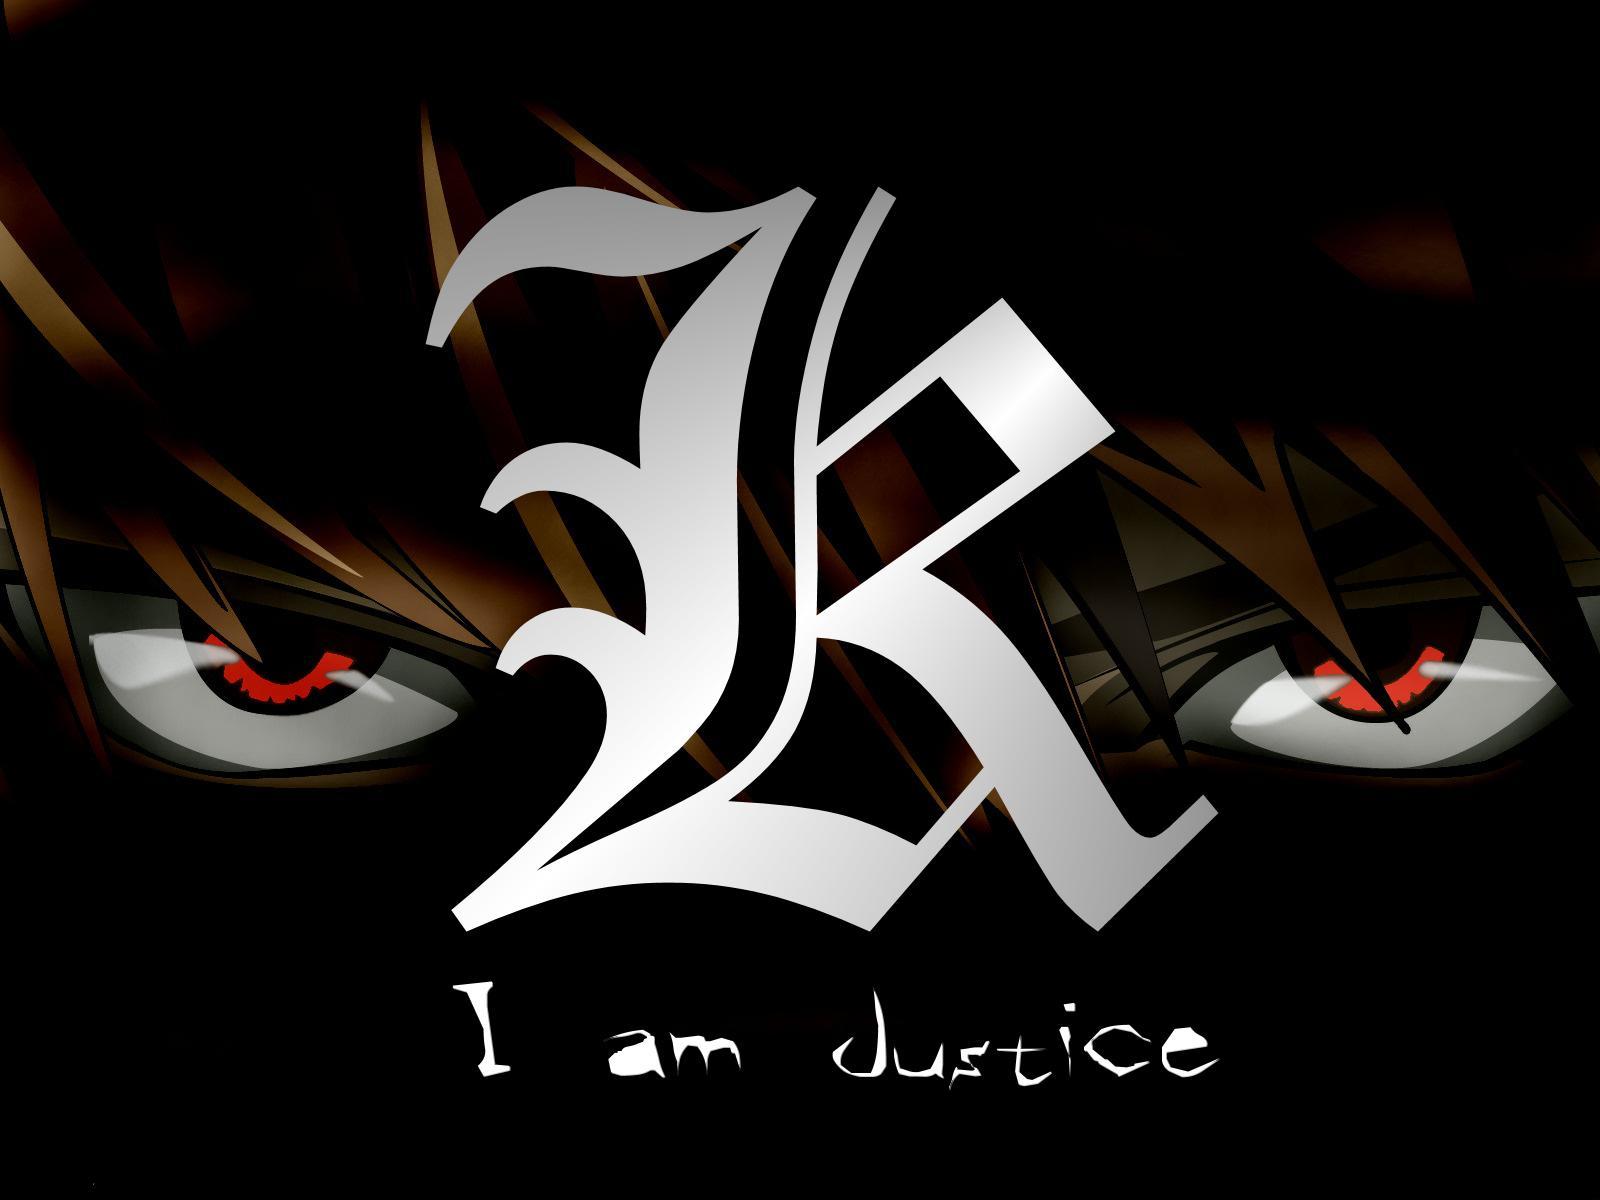 http://2.bp.blogspot.com/_Yi2CuKJrOik/TS357awnXNI/AAAAAAAAAN8/R4NjKdScVXc/s1600/death-note-51.jpg